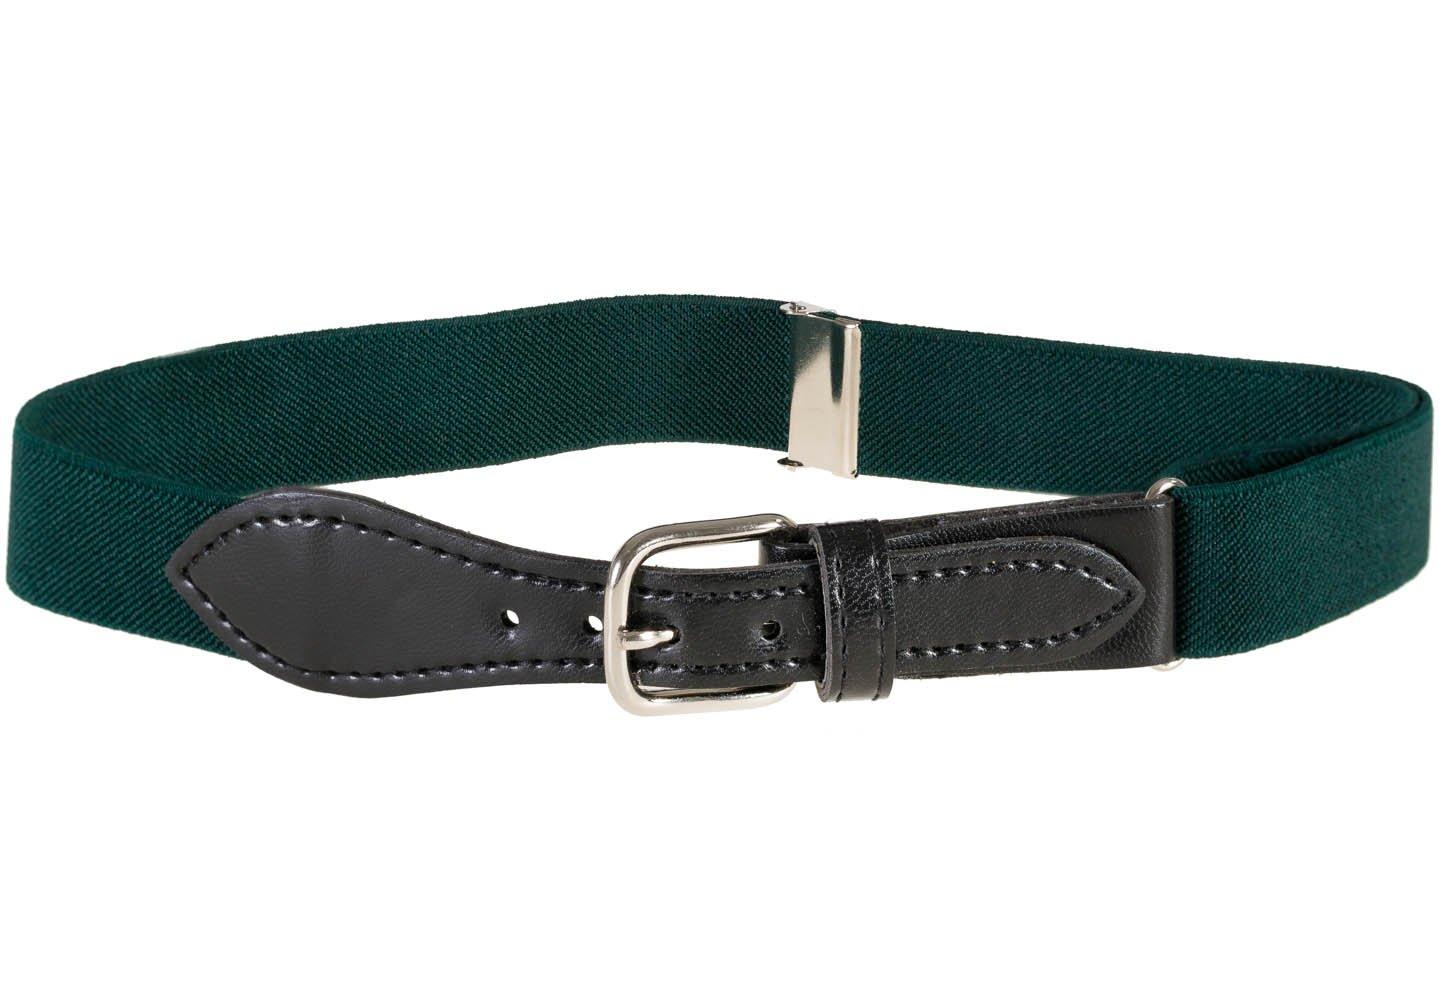 Kids Elastic Adjustable Belt with Leather Closure - Hunter Green